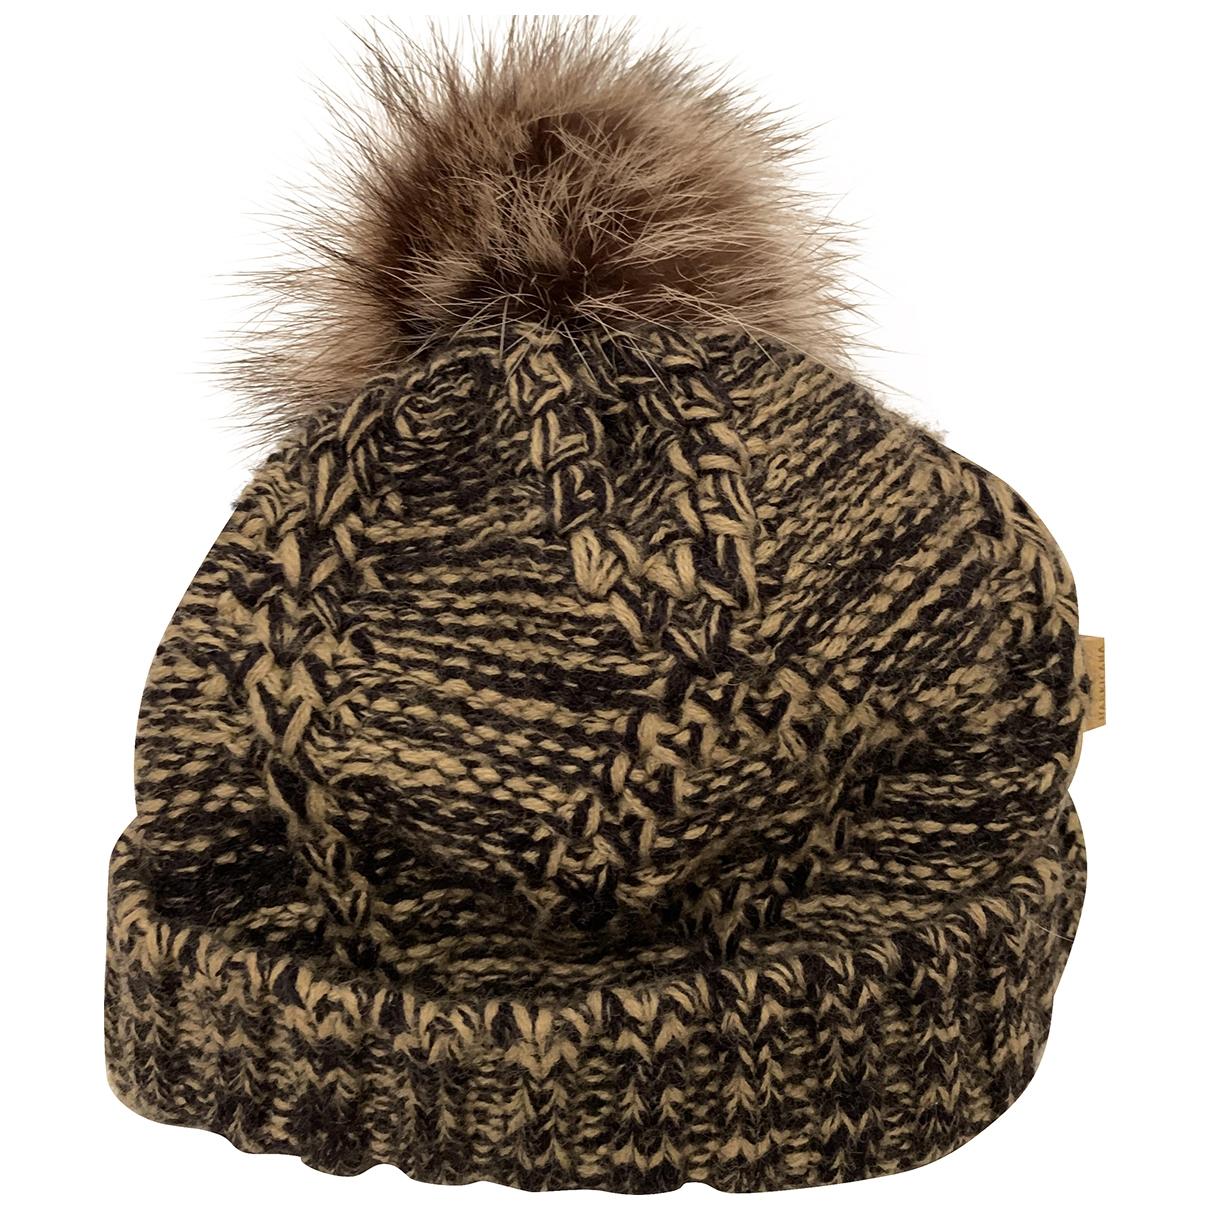 Harricana \N Brown hat for Women M International